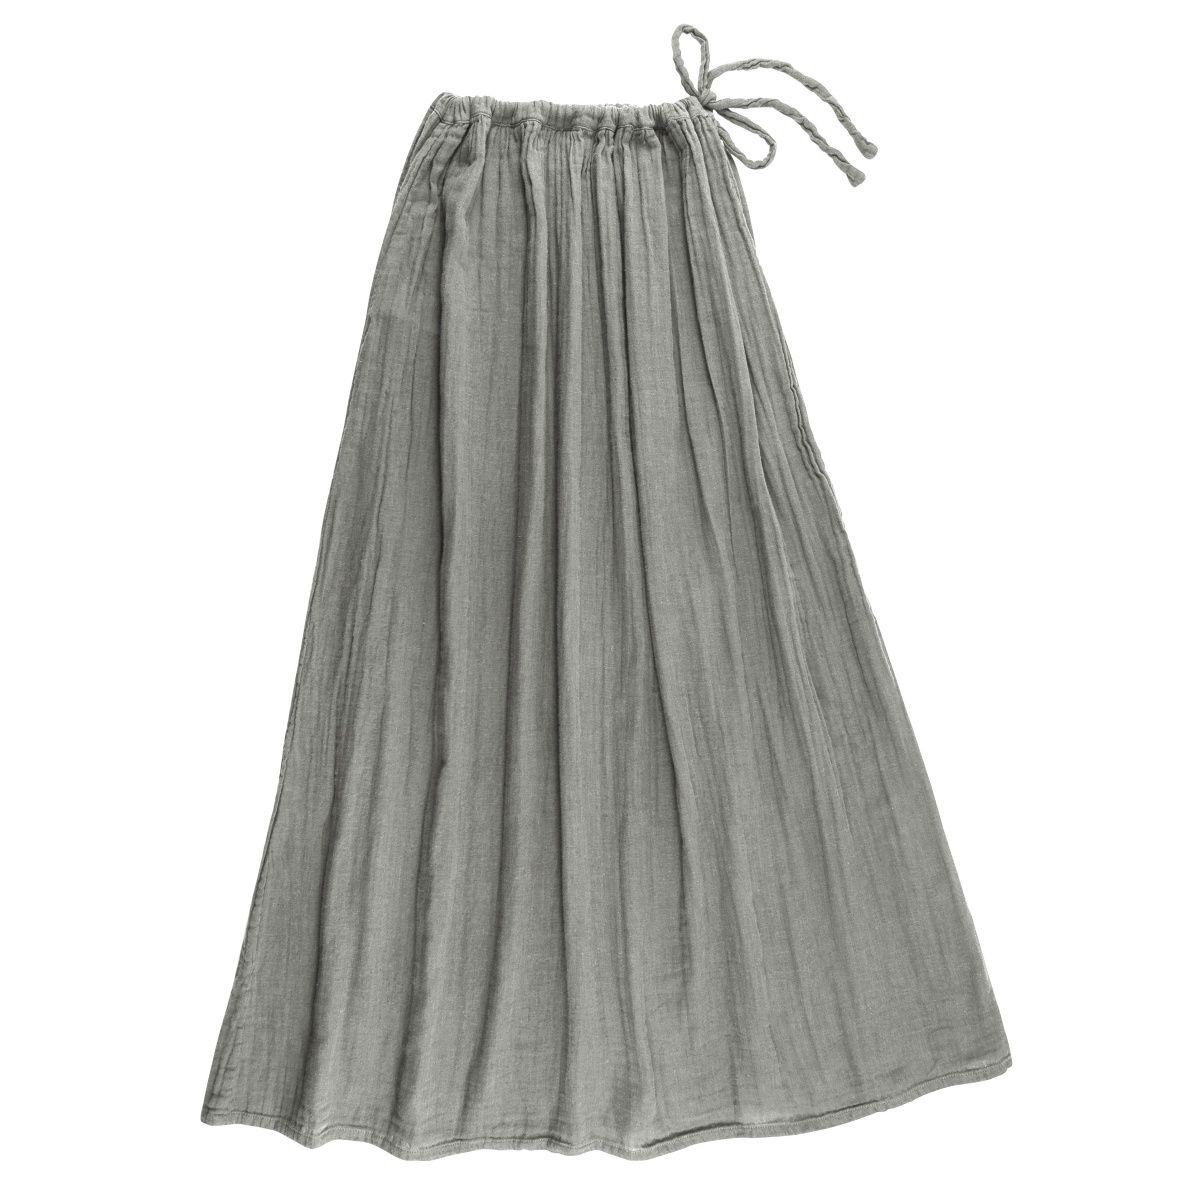 Numero 74 Spódnica dla mamy Ava długa srebrnoszara